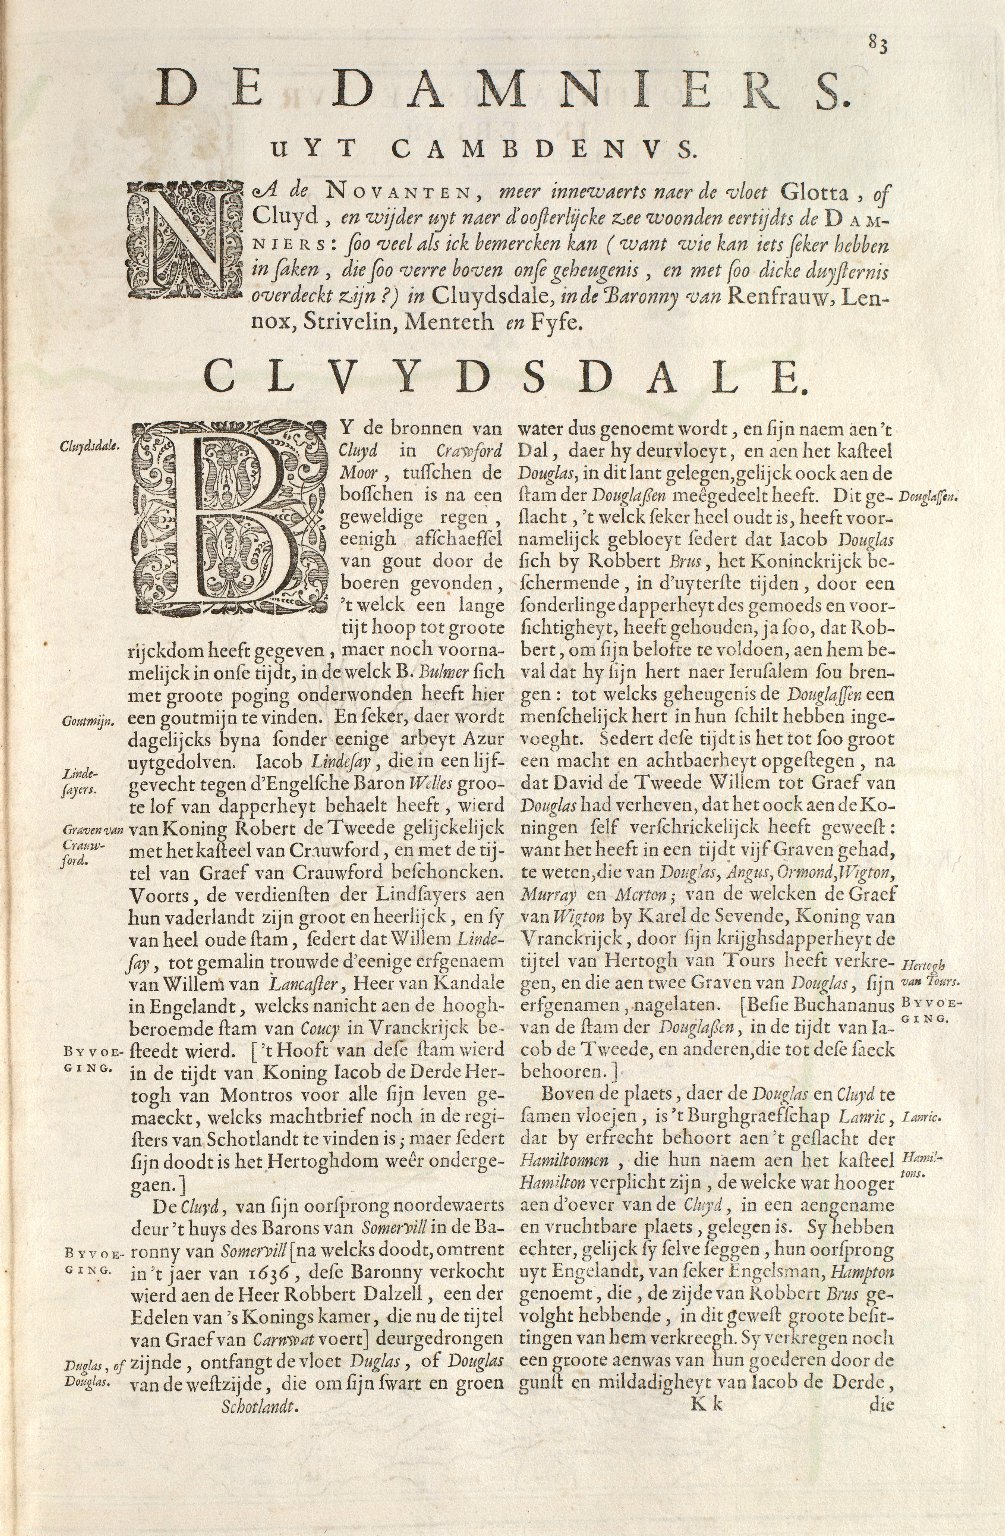 [Geographiae Blavianae] [Also known as: Atlas major] [073 of 153]